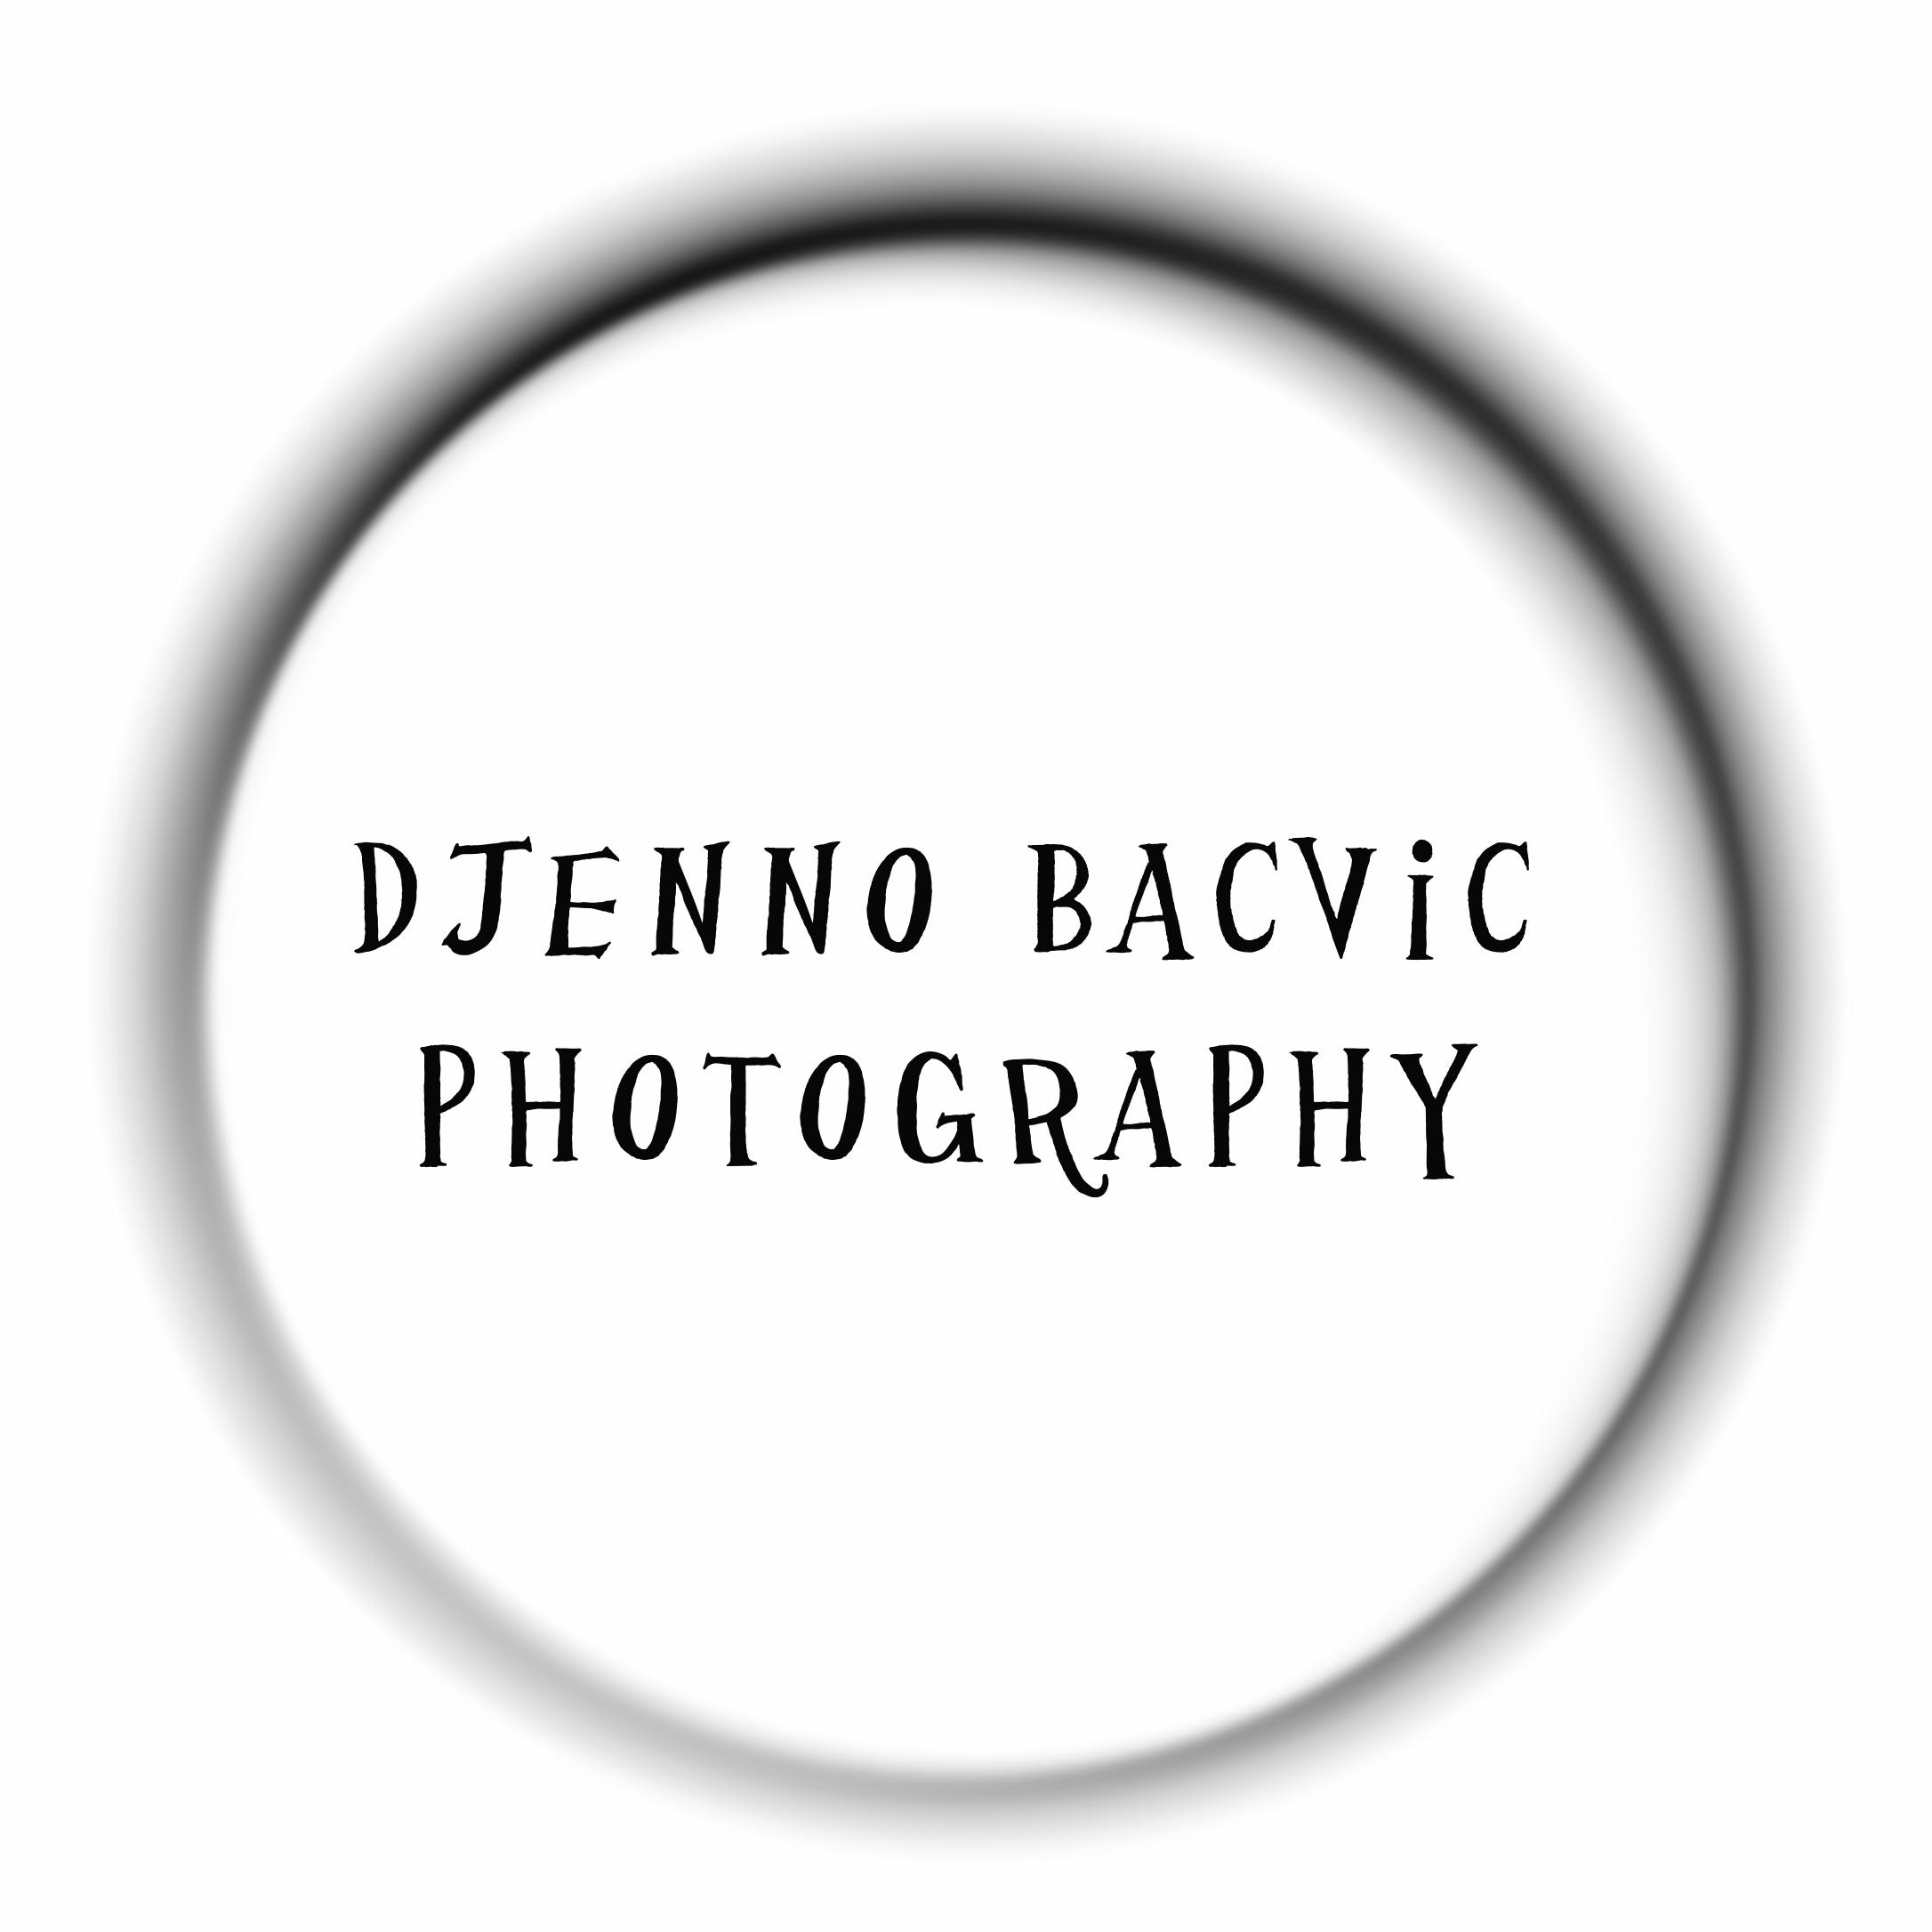 Djenno Bacvic Photography Logo.jpg